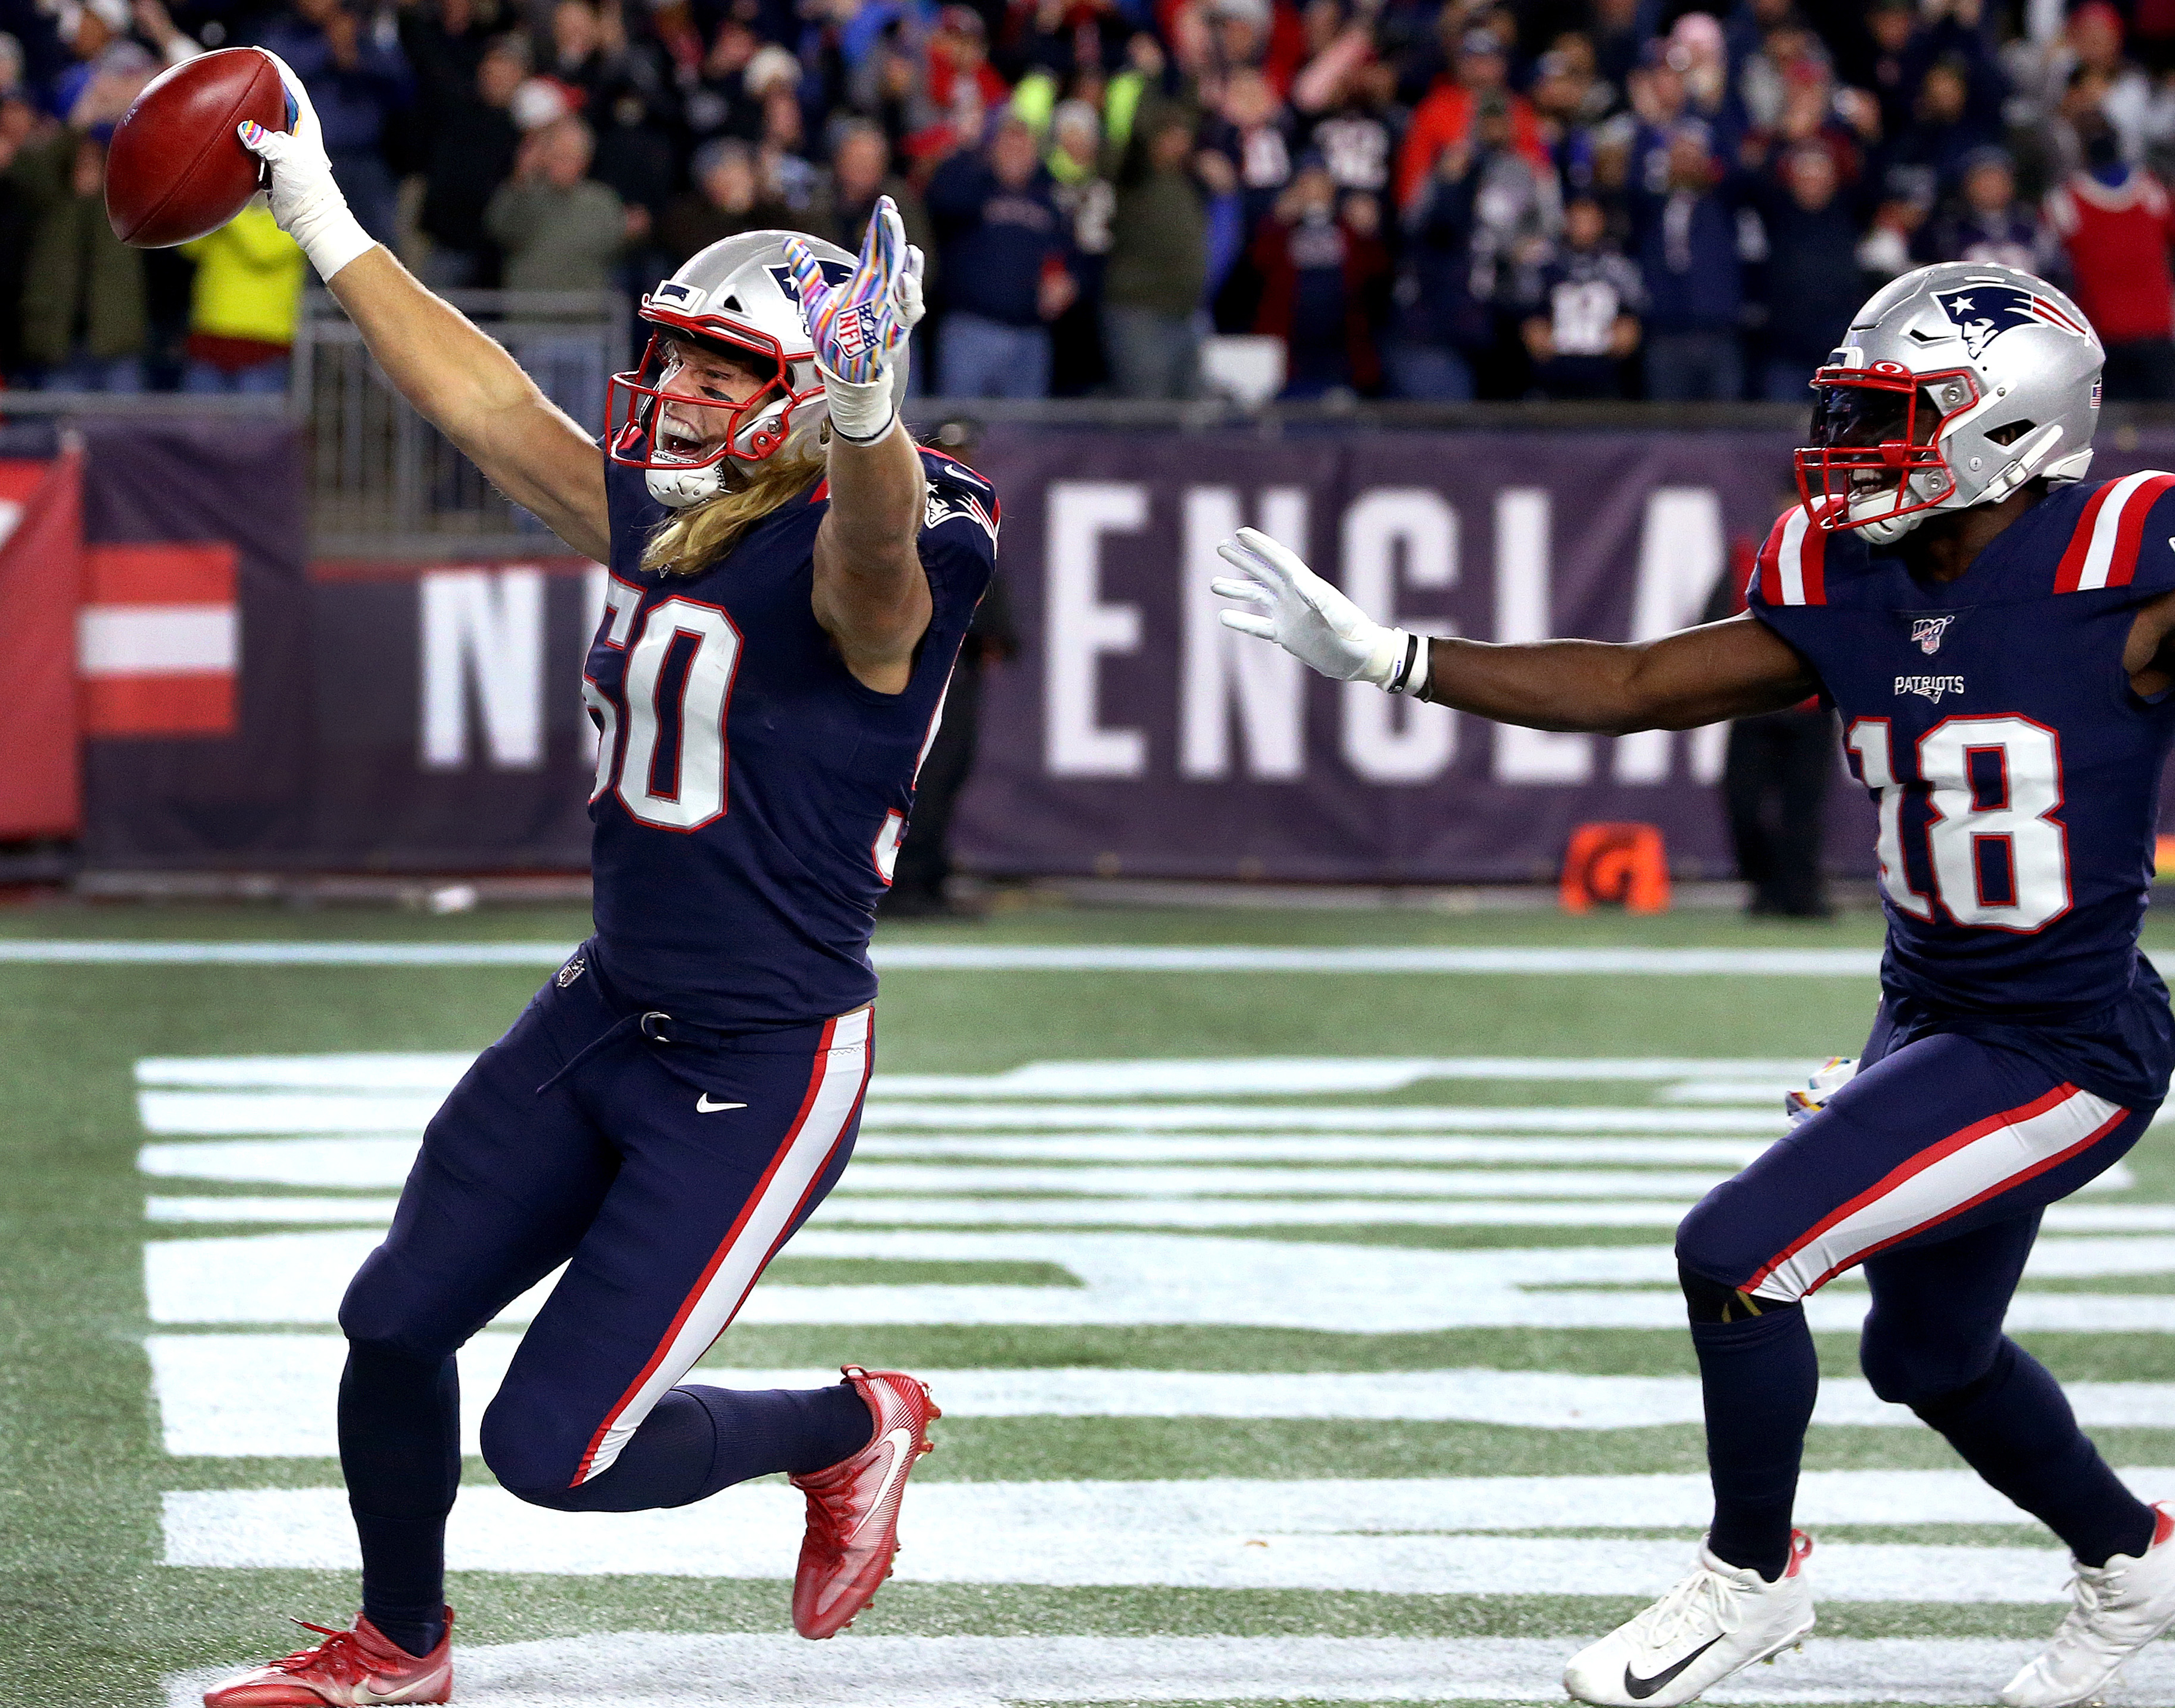 Patriots unveil new-look uniforms for 2020 season - The Boston Globe